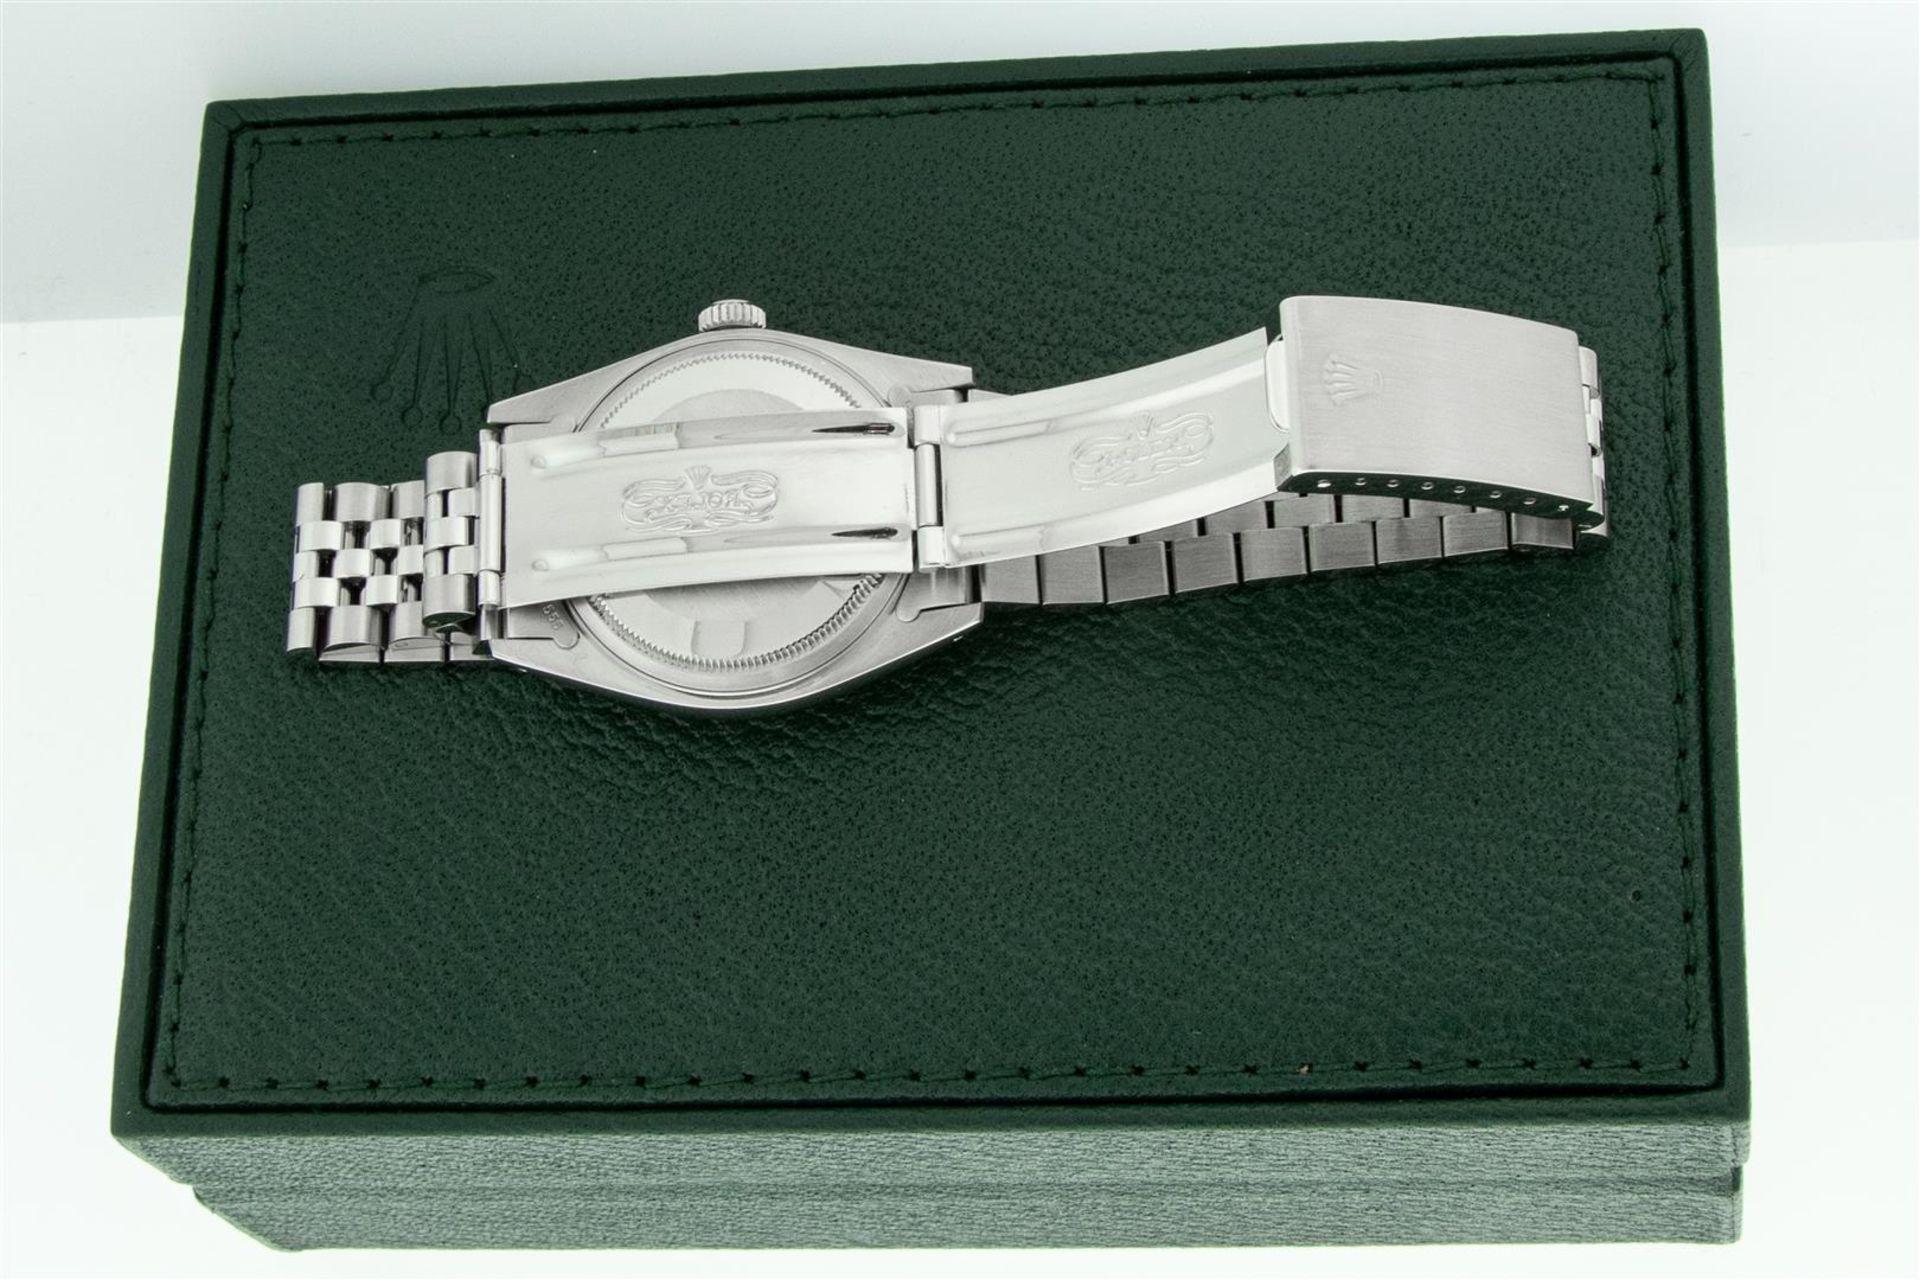 Rolex Mens Stainless Steel Meteorite Diamond 36MM Oyster Perpetual Datejust Wris - Image 7 of 9